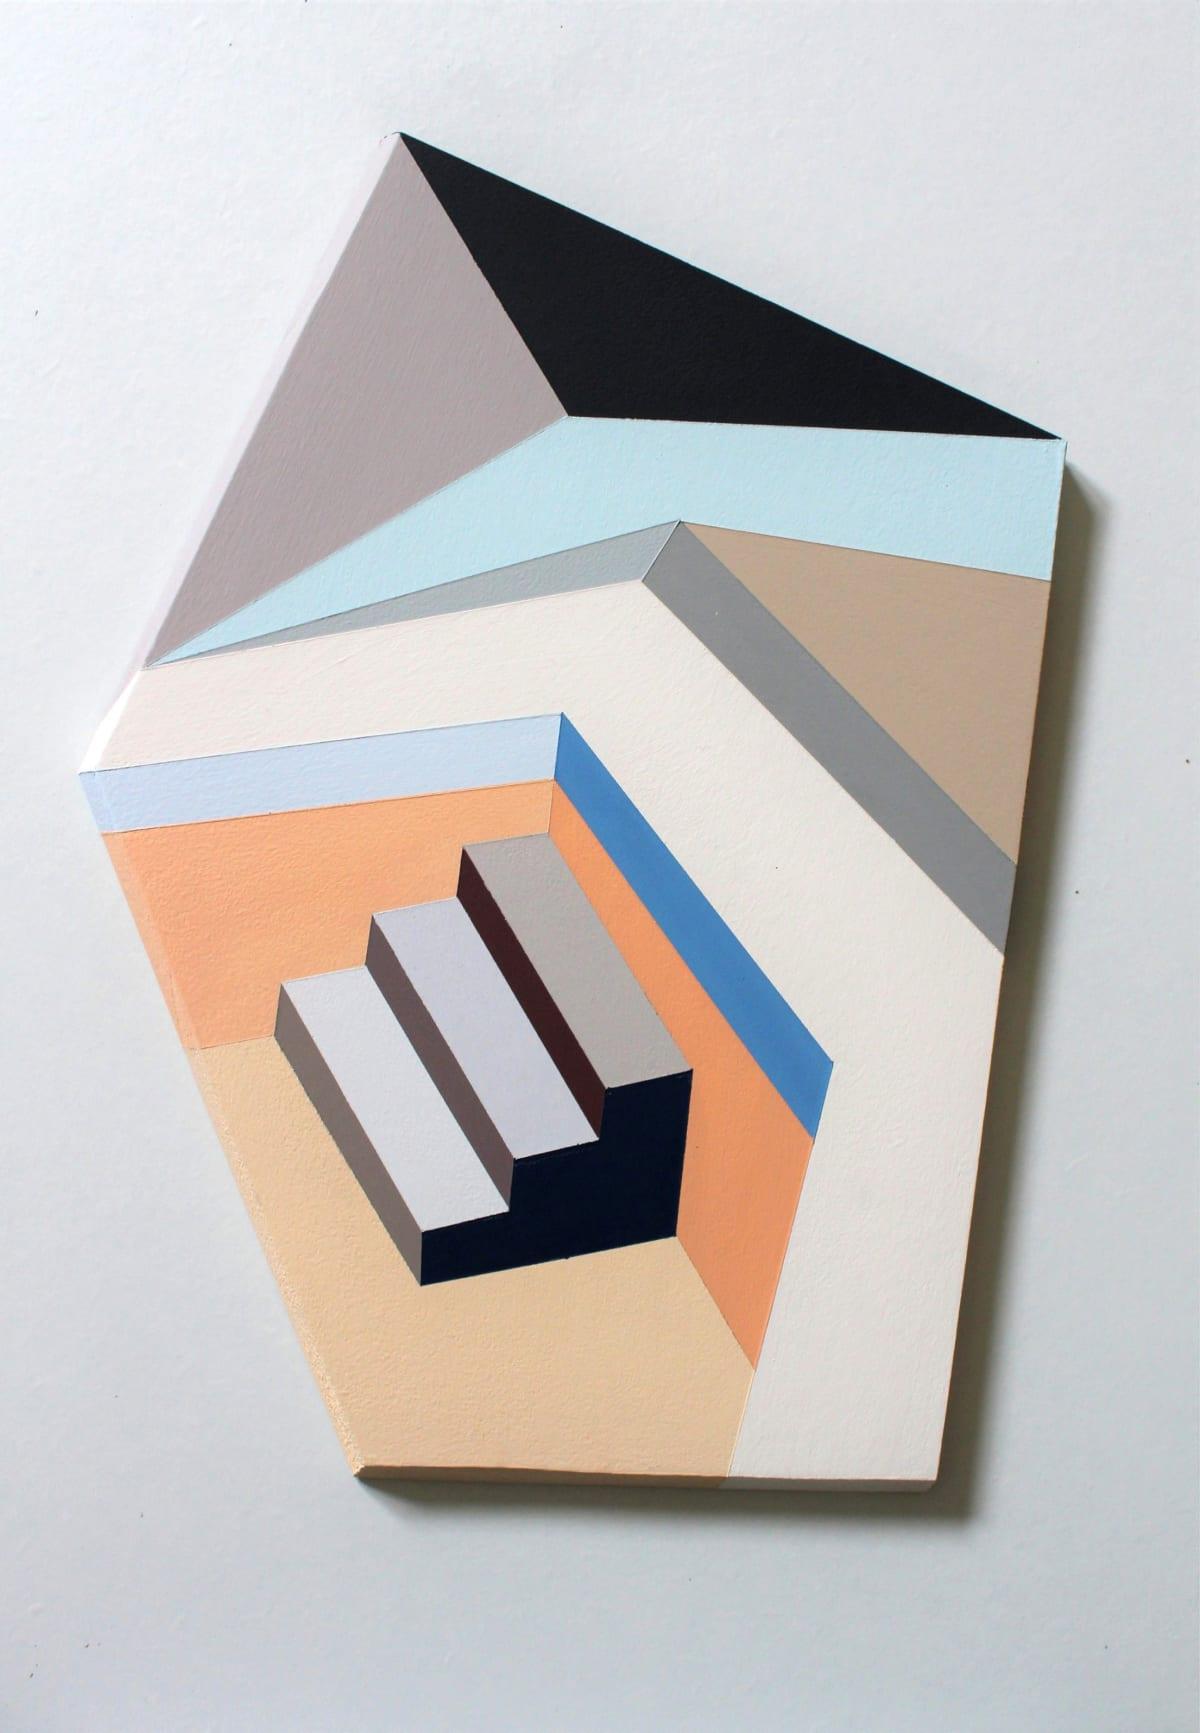 Megan Burns, Altered space 0.12, emulsion on board, 38 x 27 cm